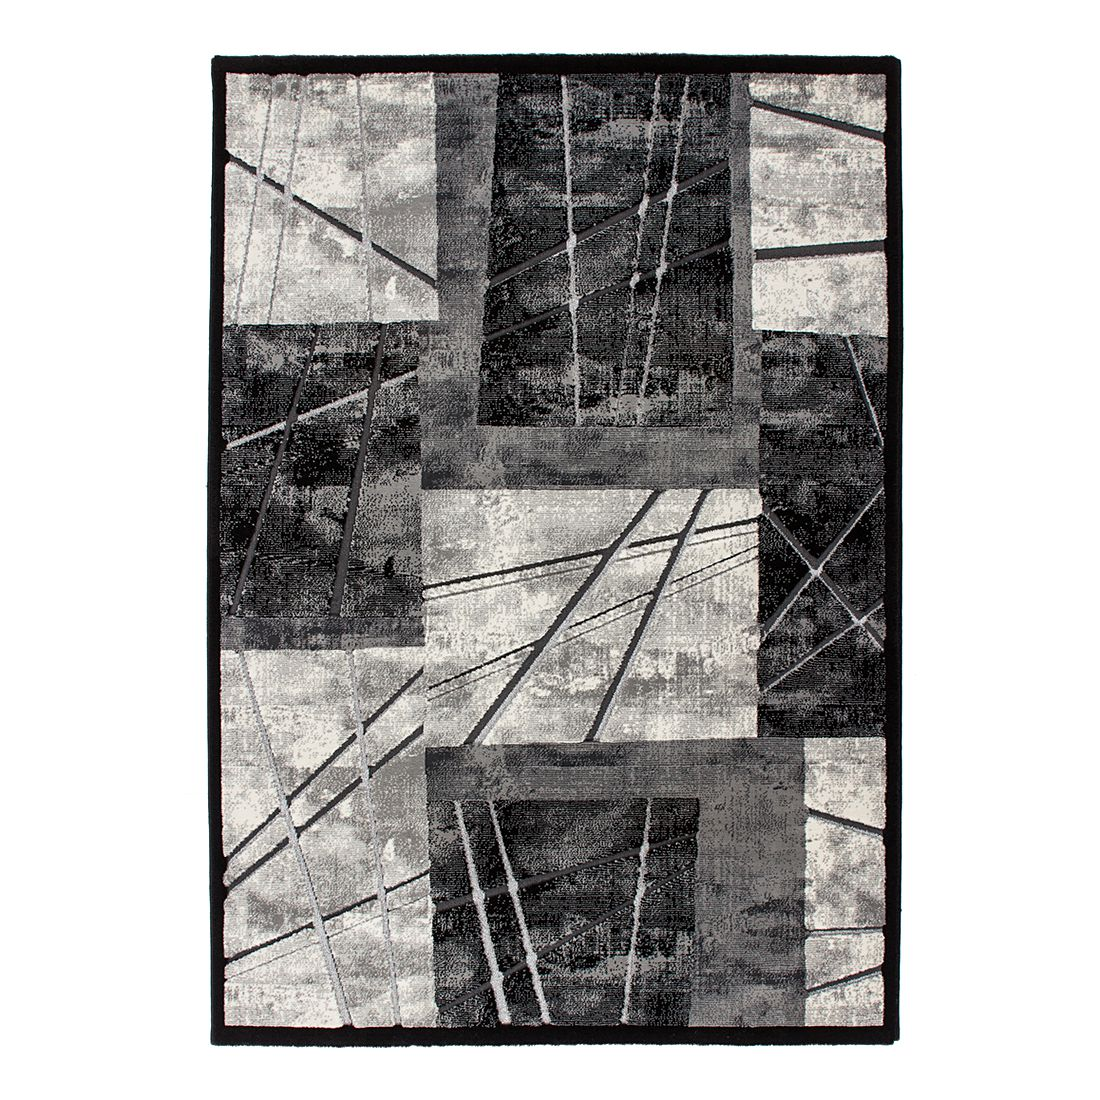 Teppich Egypt – Hurghada – Grau – 80 x 300 cm, Kayoom kaufen